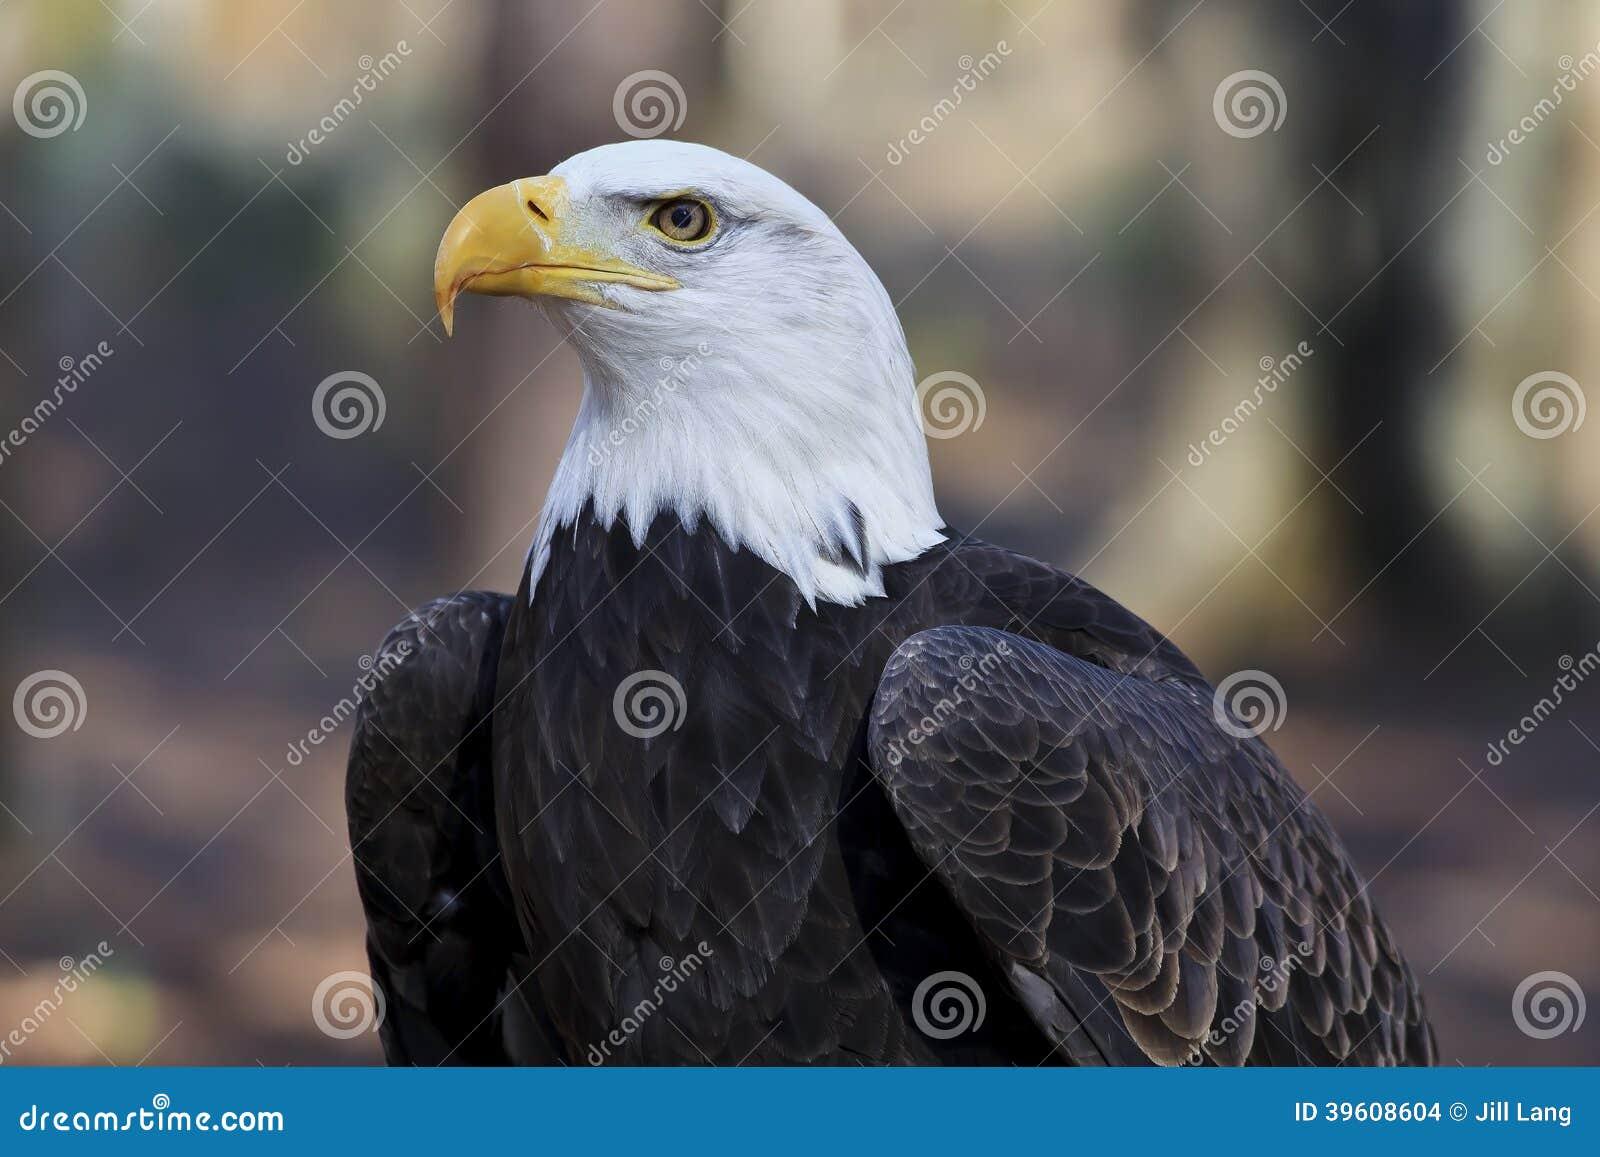 Bald eagle head front - photo#3